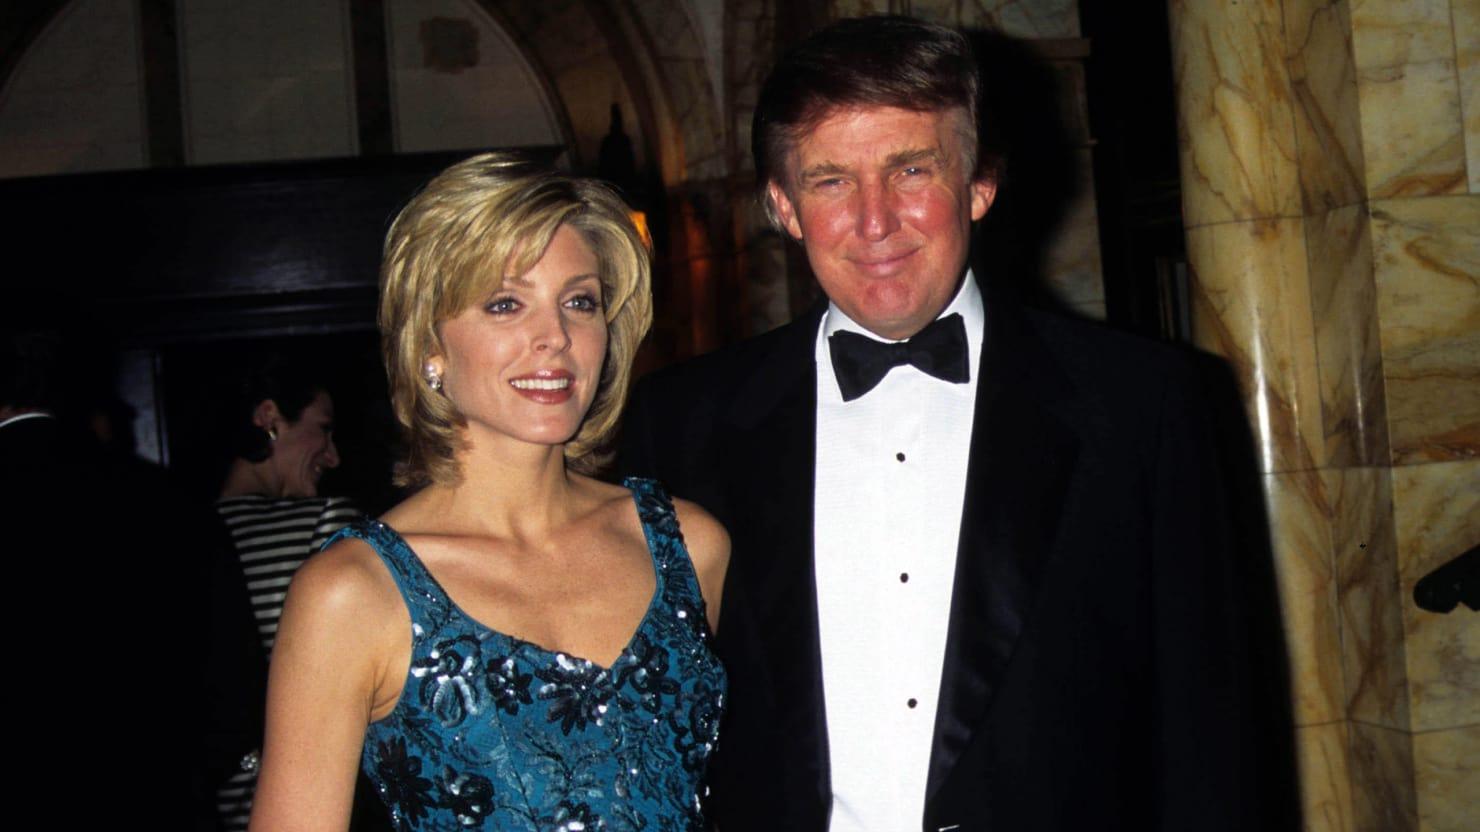 Donald-Trump-27